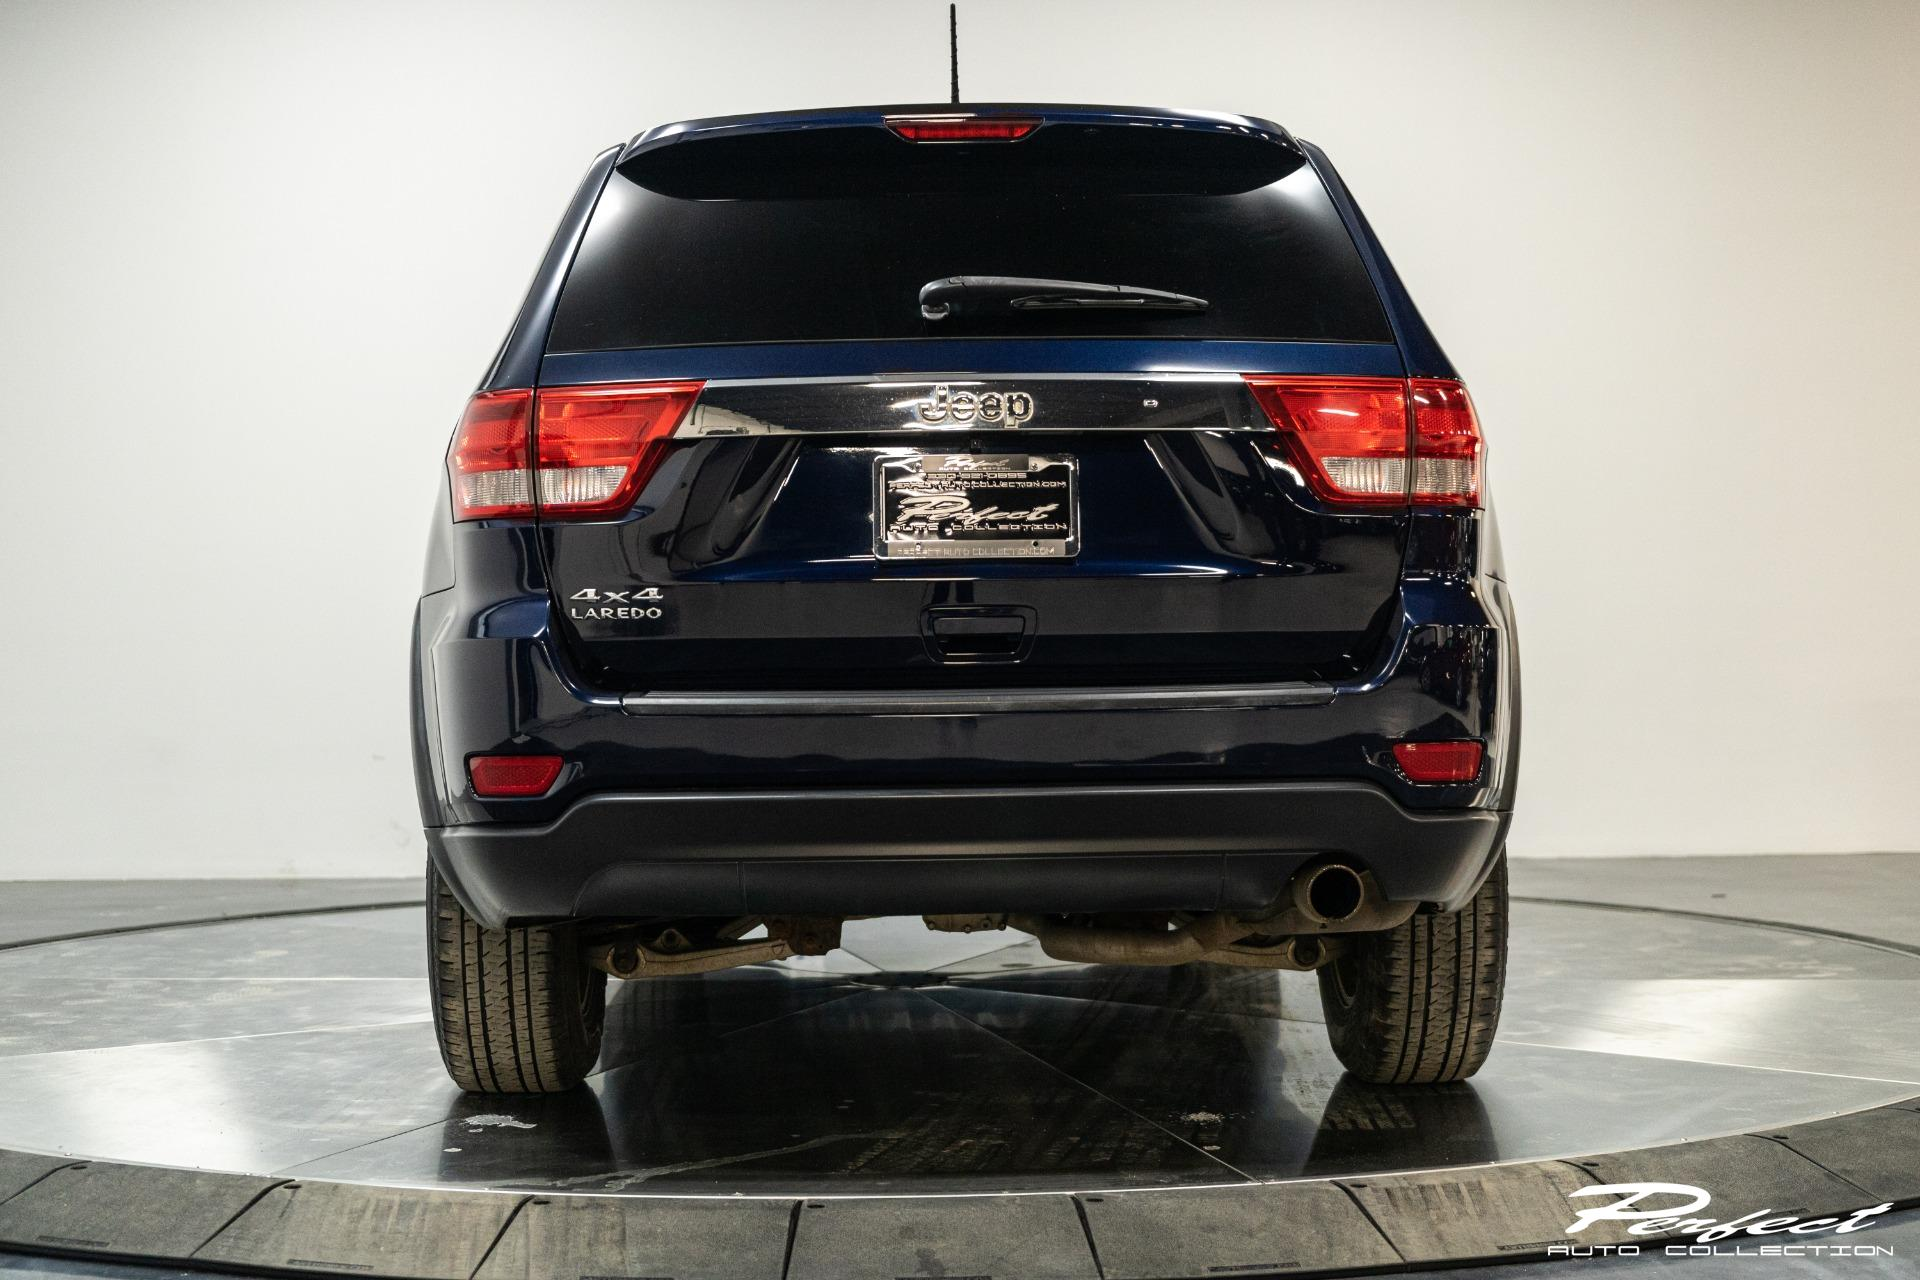 Used 2012 Jeep Grand Cherokee Laredo For Sale ($9,993 ...